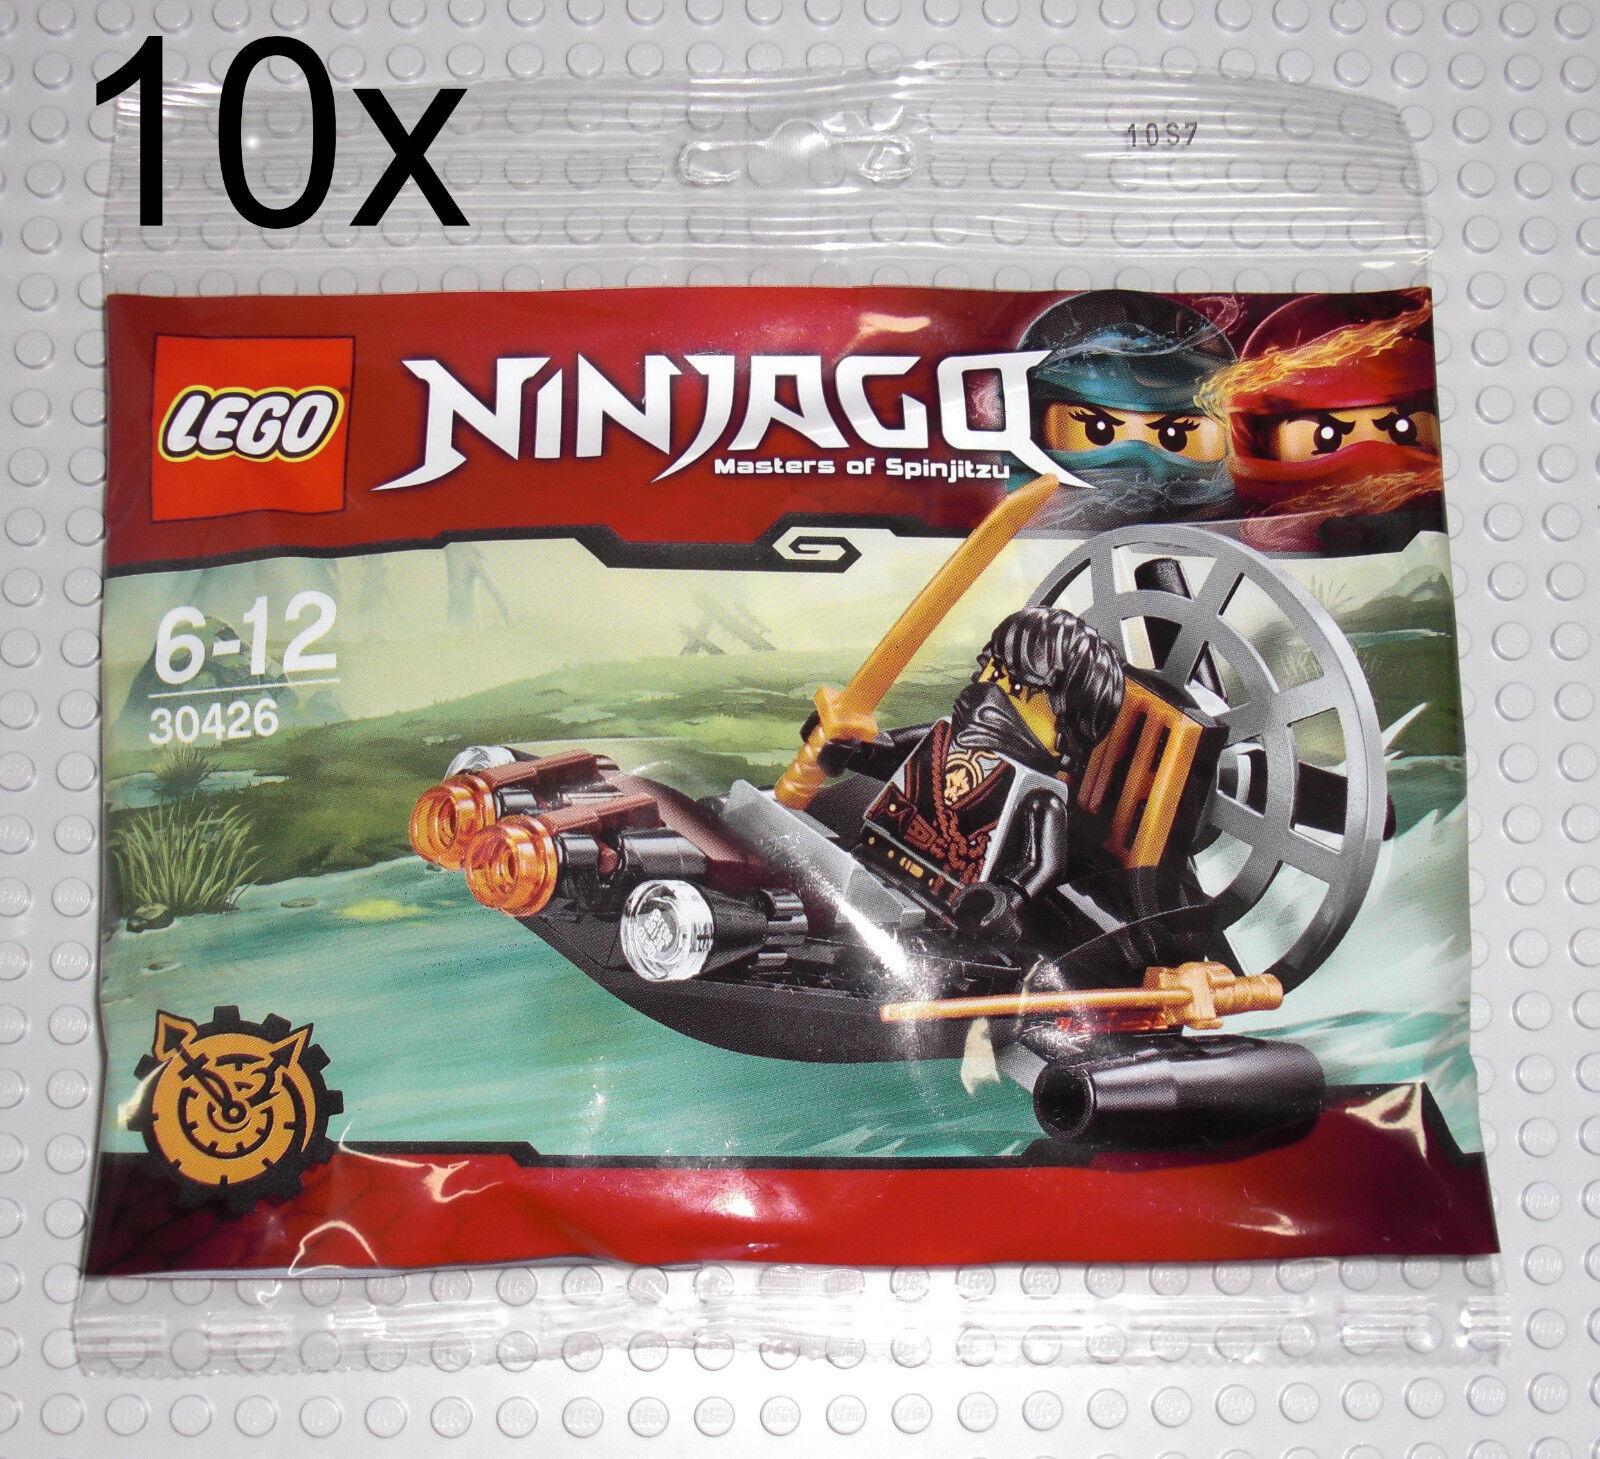 LEGO Ninjago 10x 30426 Coles Sumpfstivali / Luftkissenstivali - Cole PolyBorsa 6176960